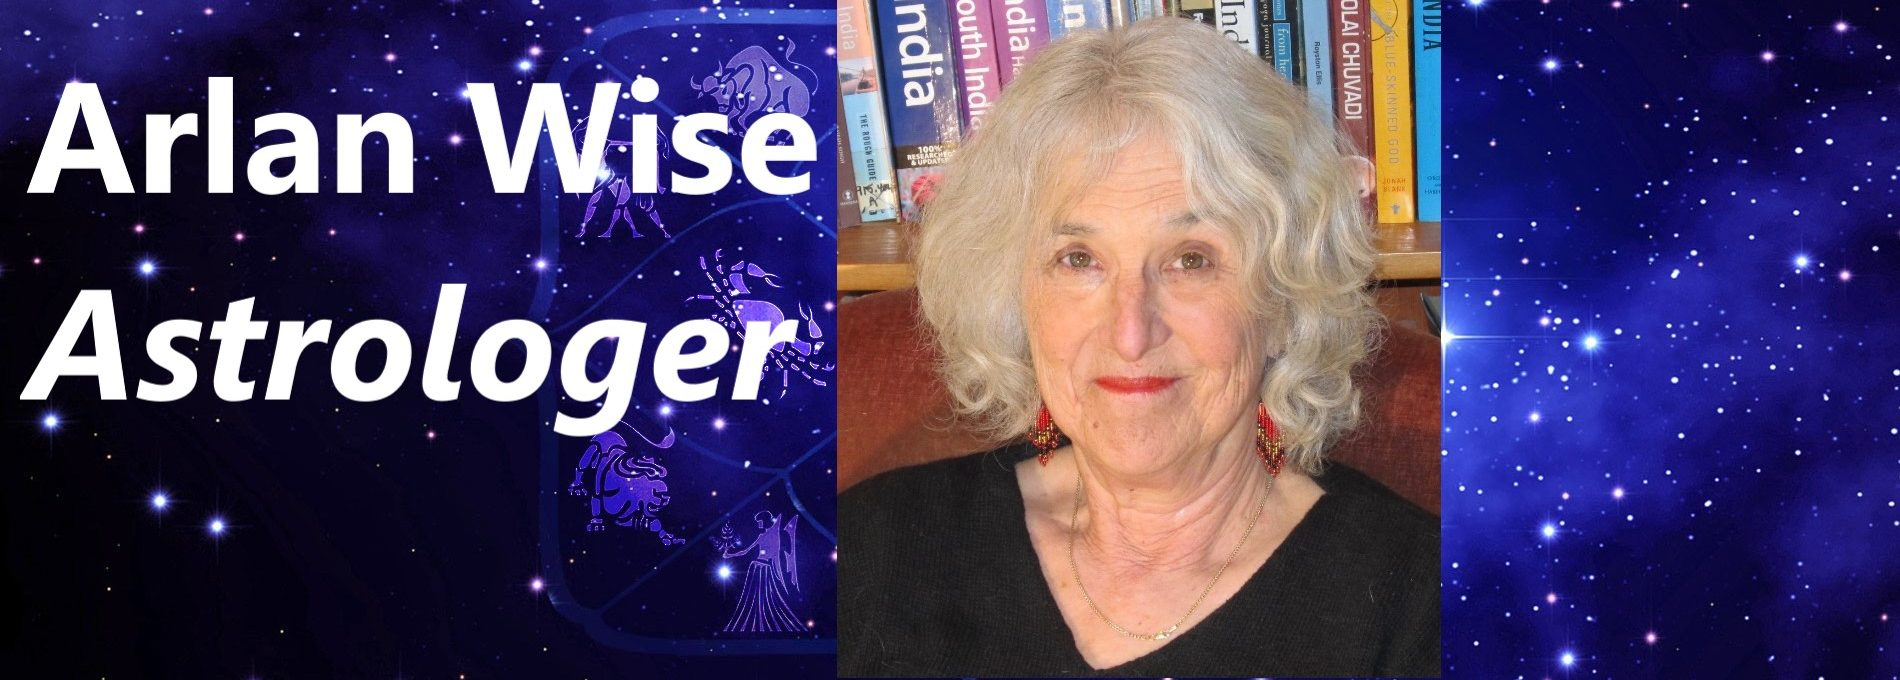 Arlan Wise Astrologer